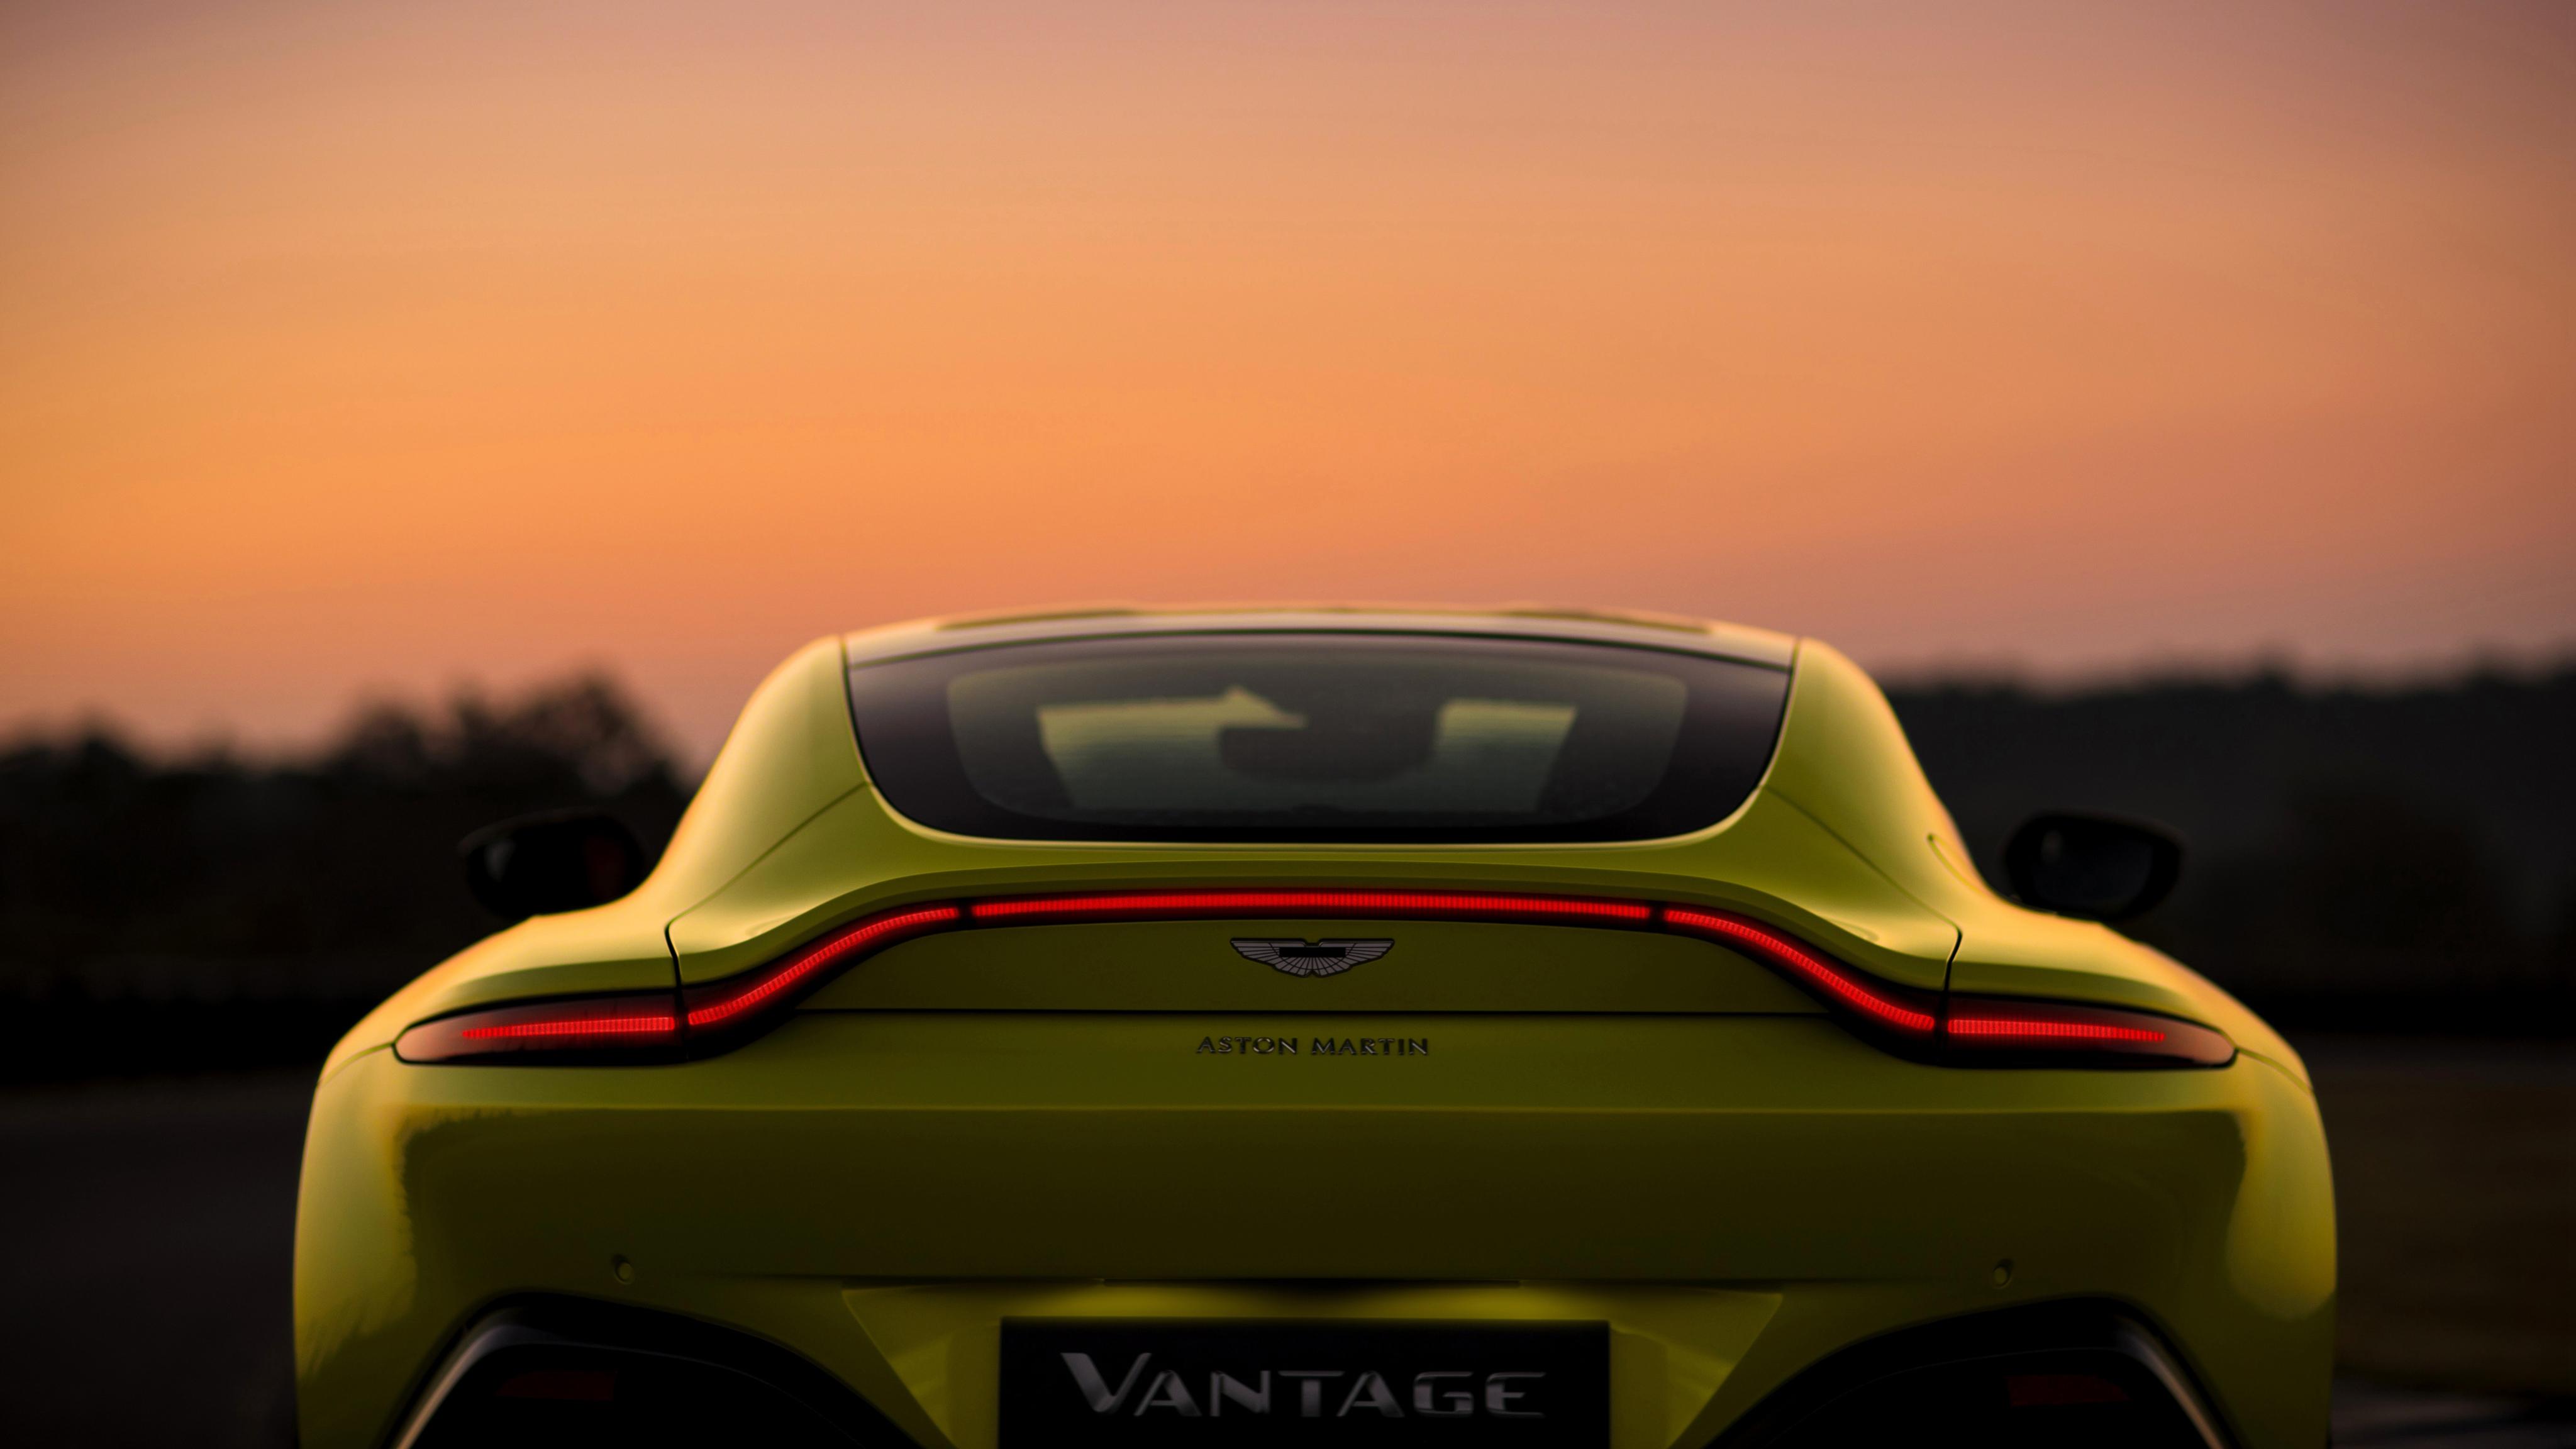 2018 Aston Martin Vantage 4k 4 Wallpaper Hd Car